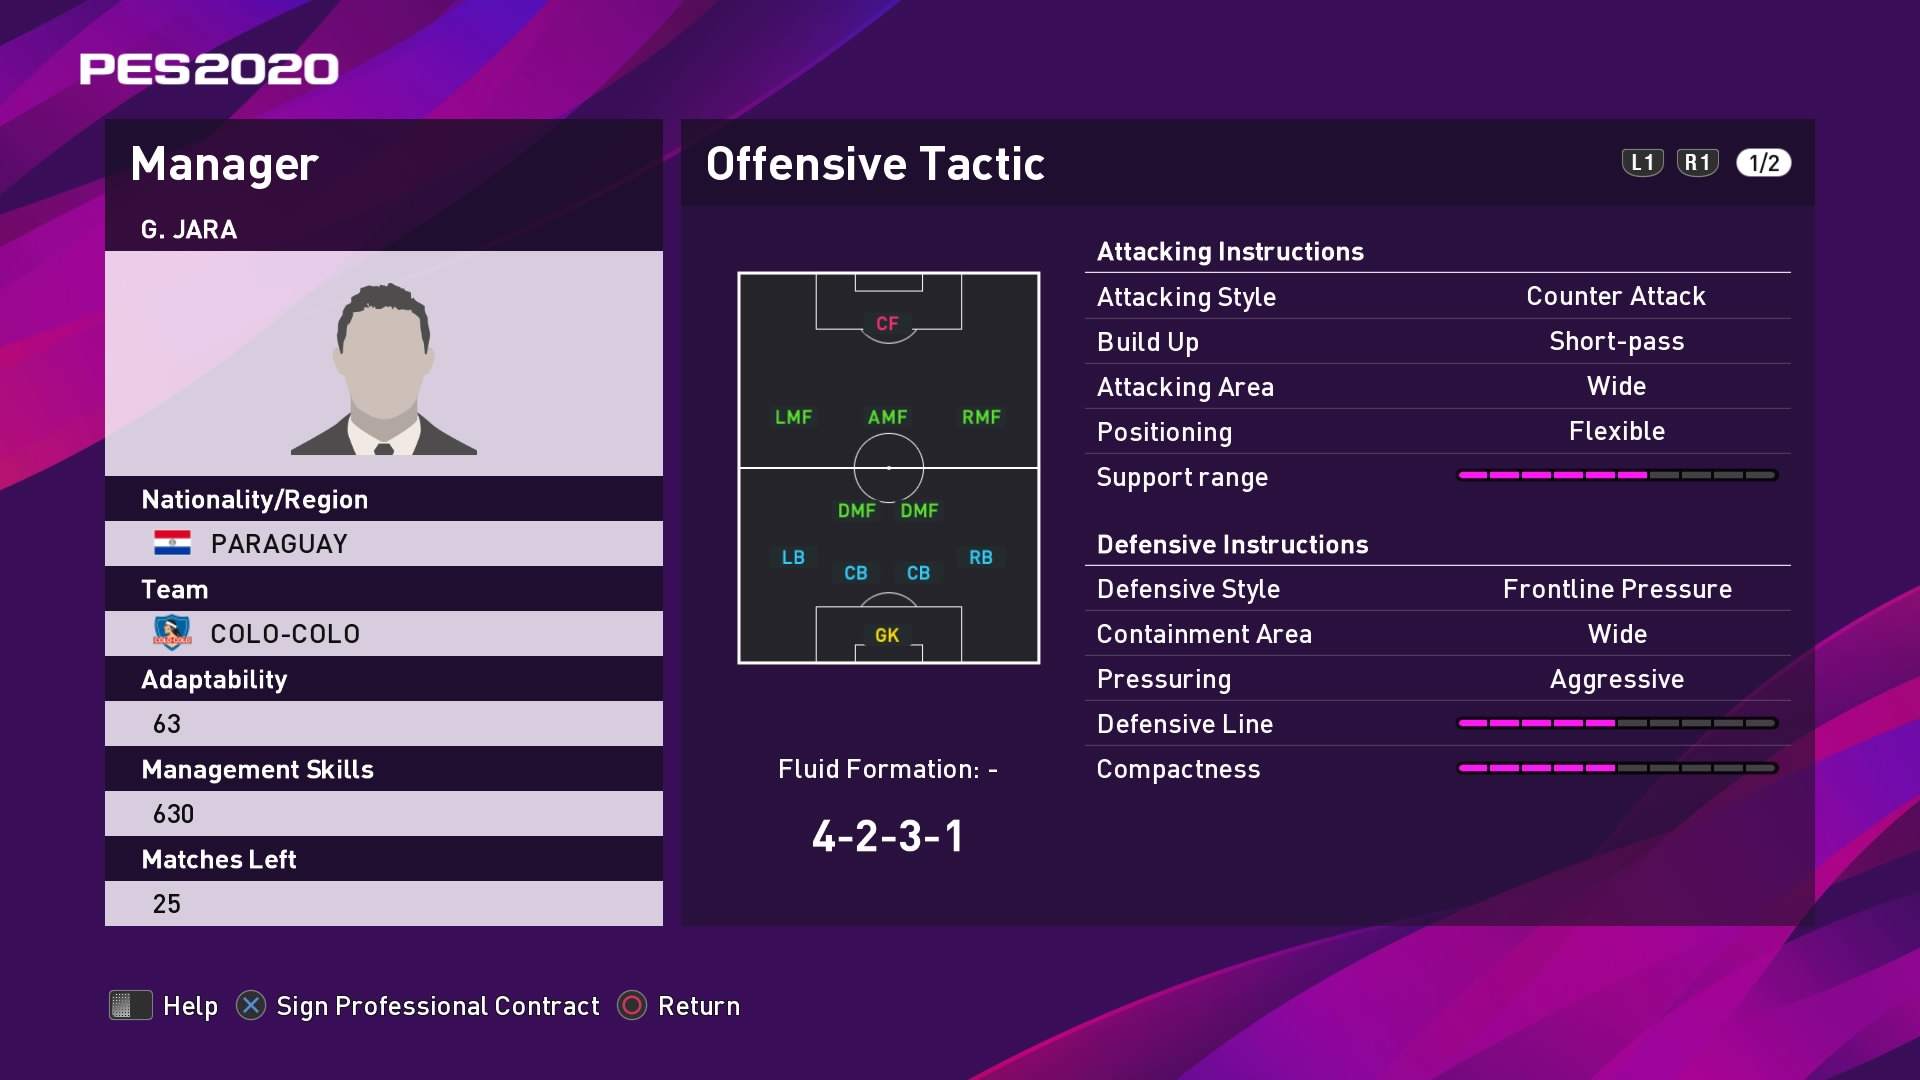 G. Jara (Gualberto Jara) Offensive Tactic in PES 2020 myClub